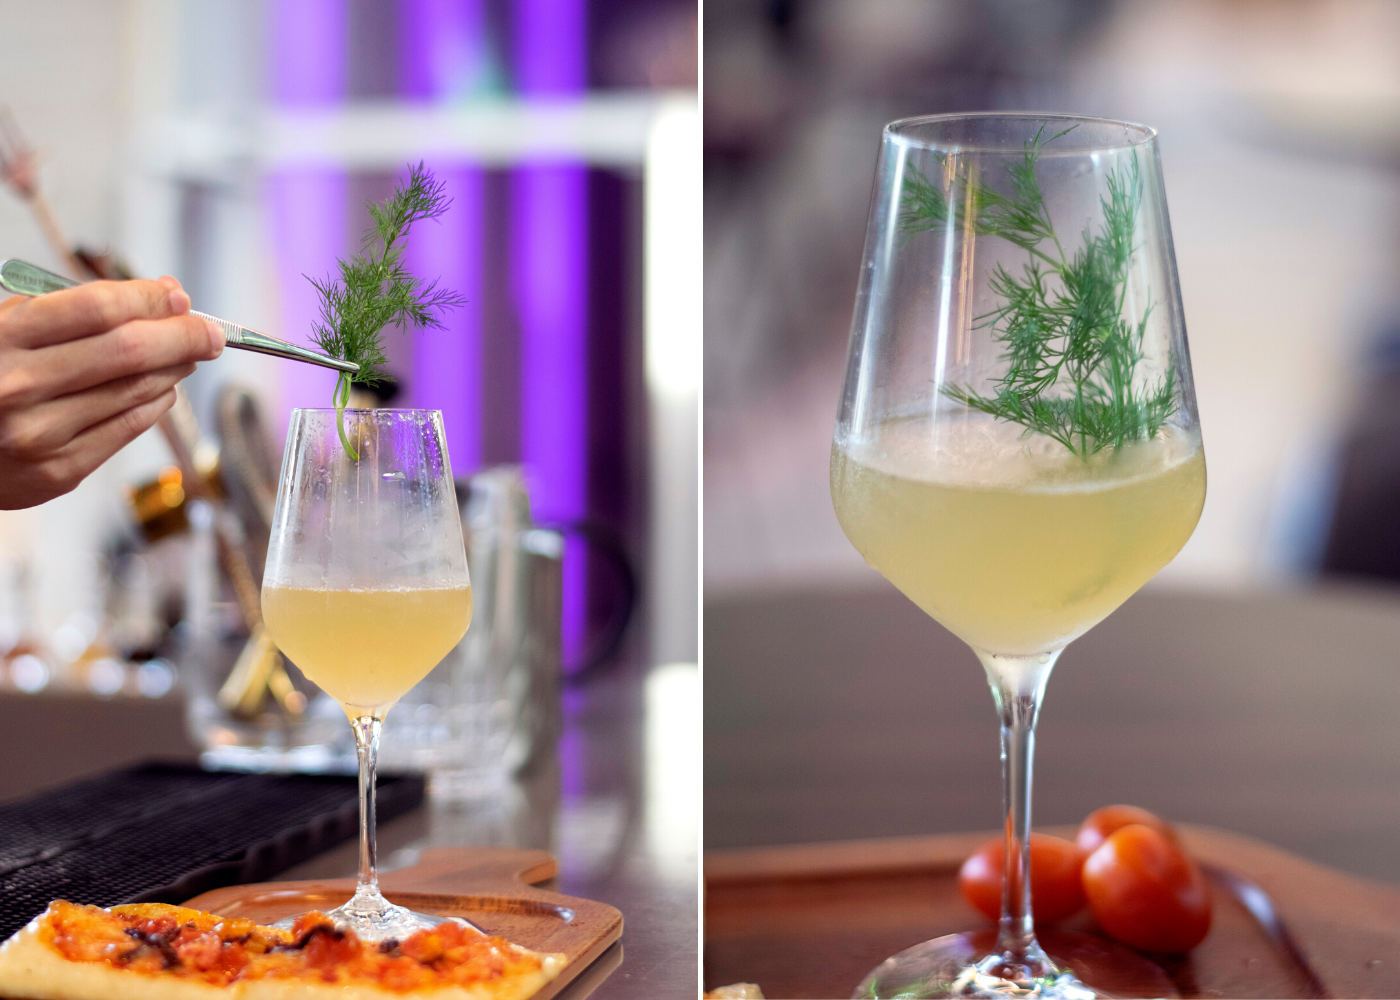 Komyuniti's tomato grande cocktail | New tipples in Singapore March 2020